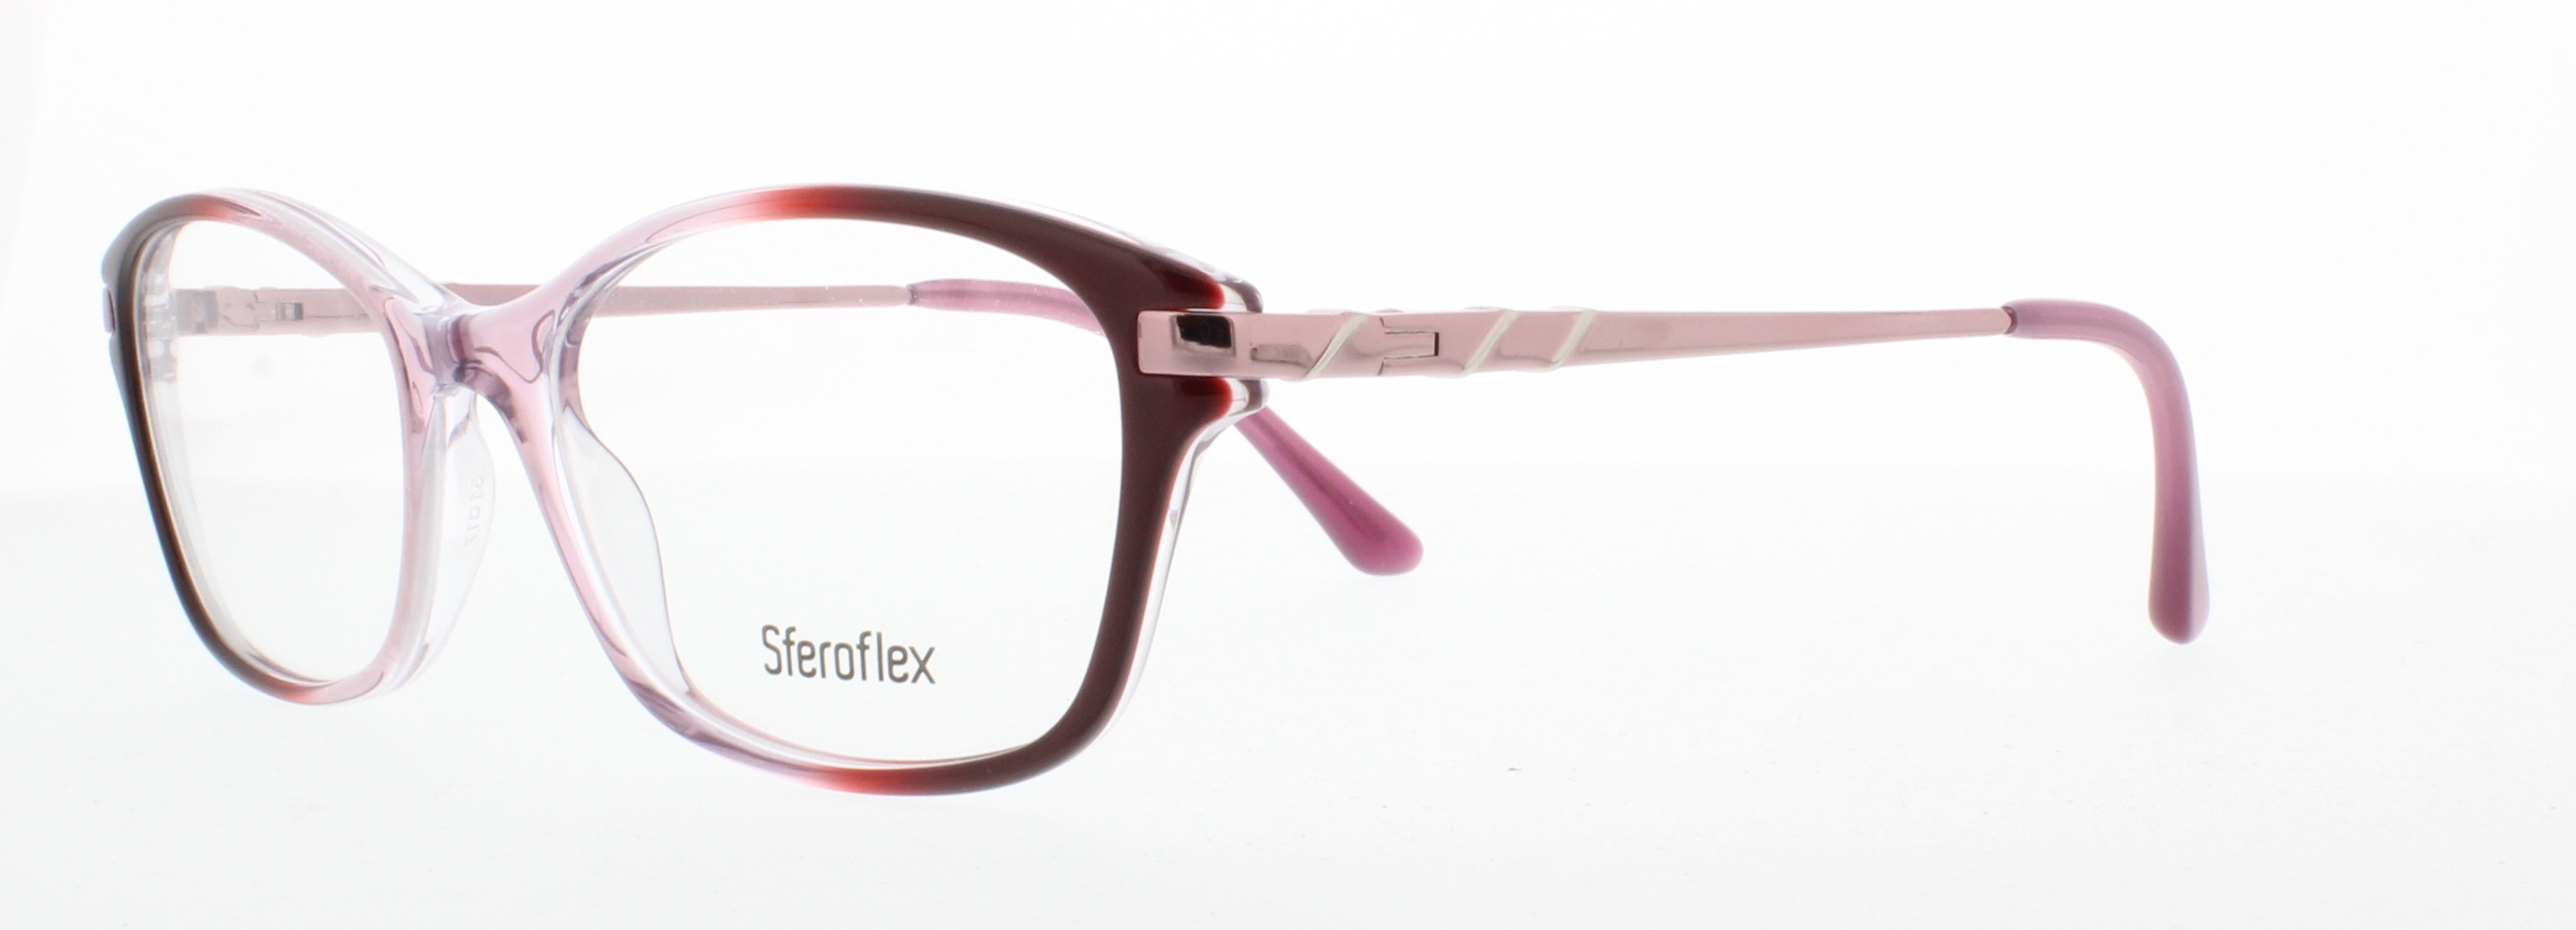 Designer Frames Outlet. Sferoflex SF1556